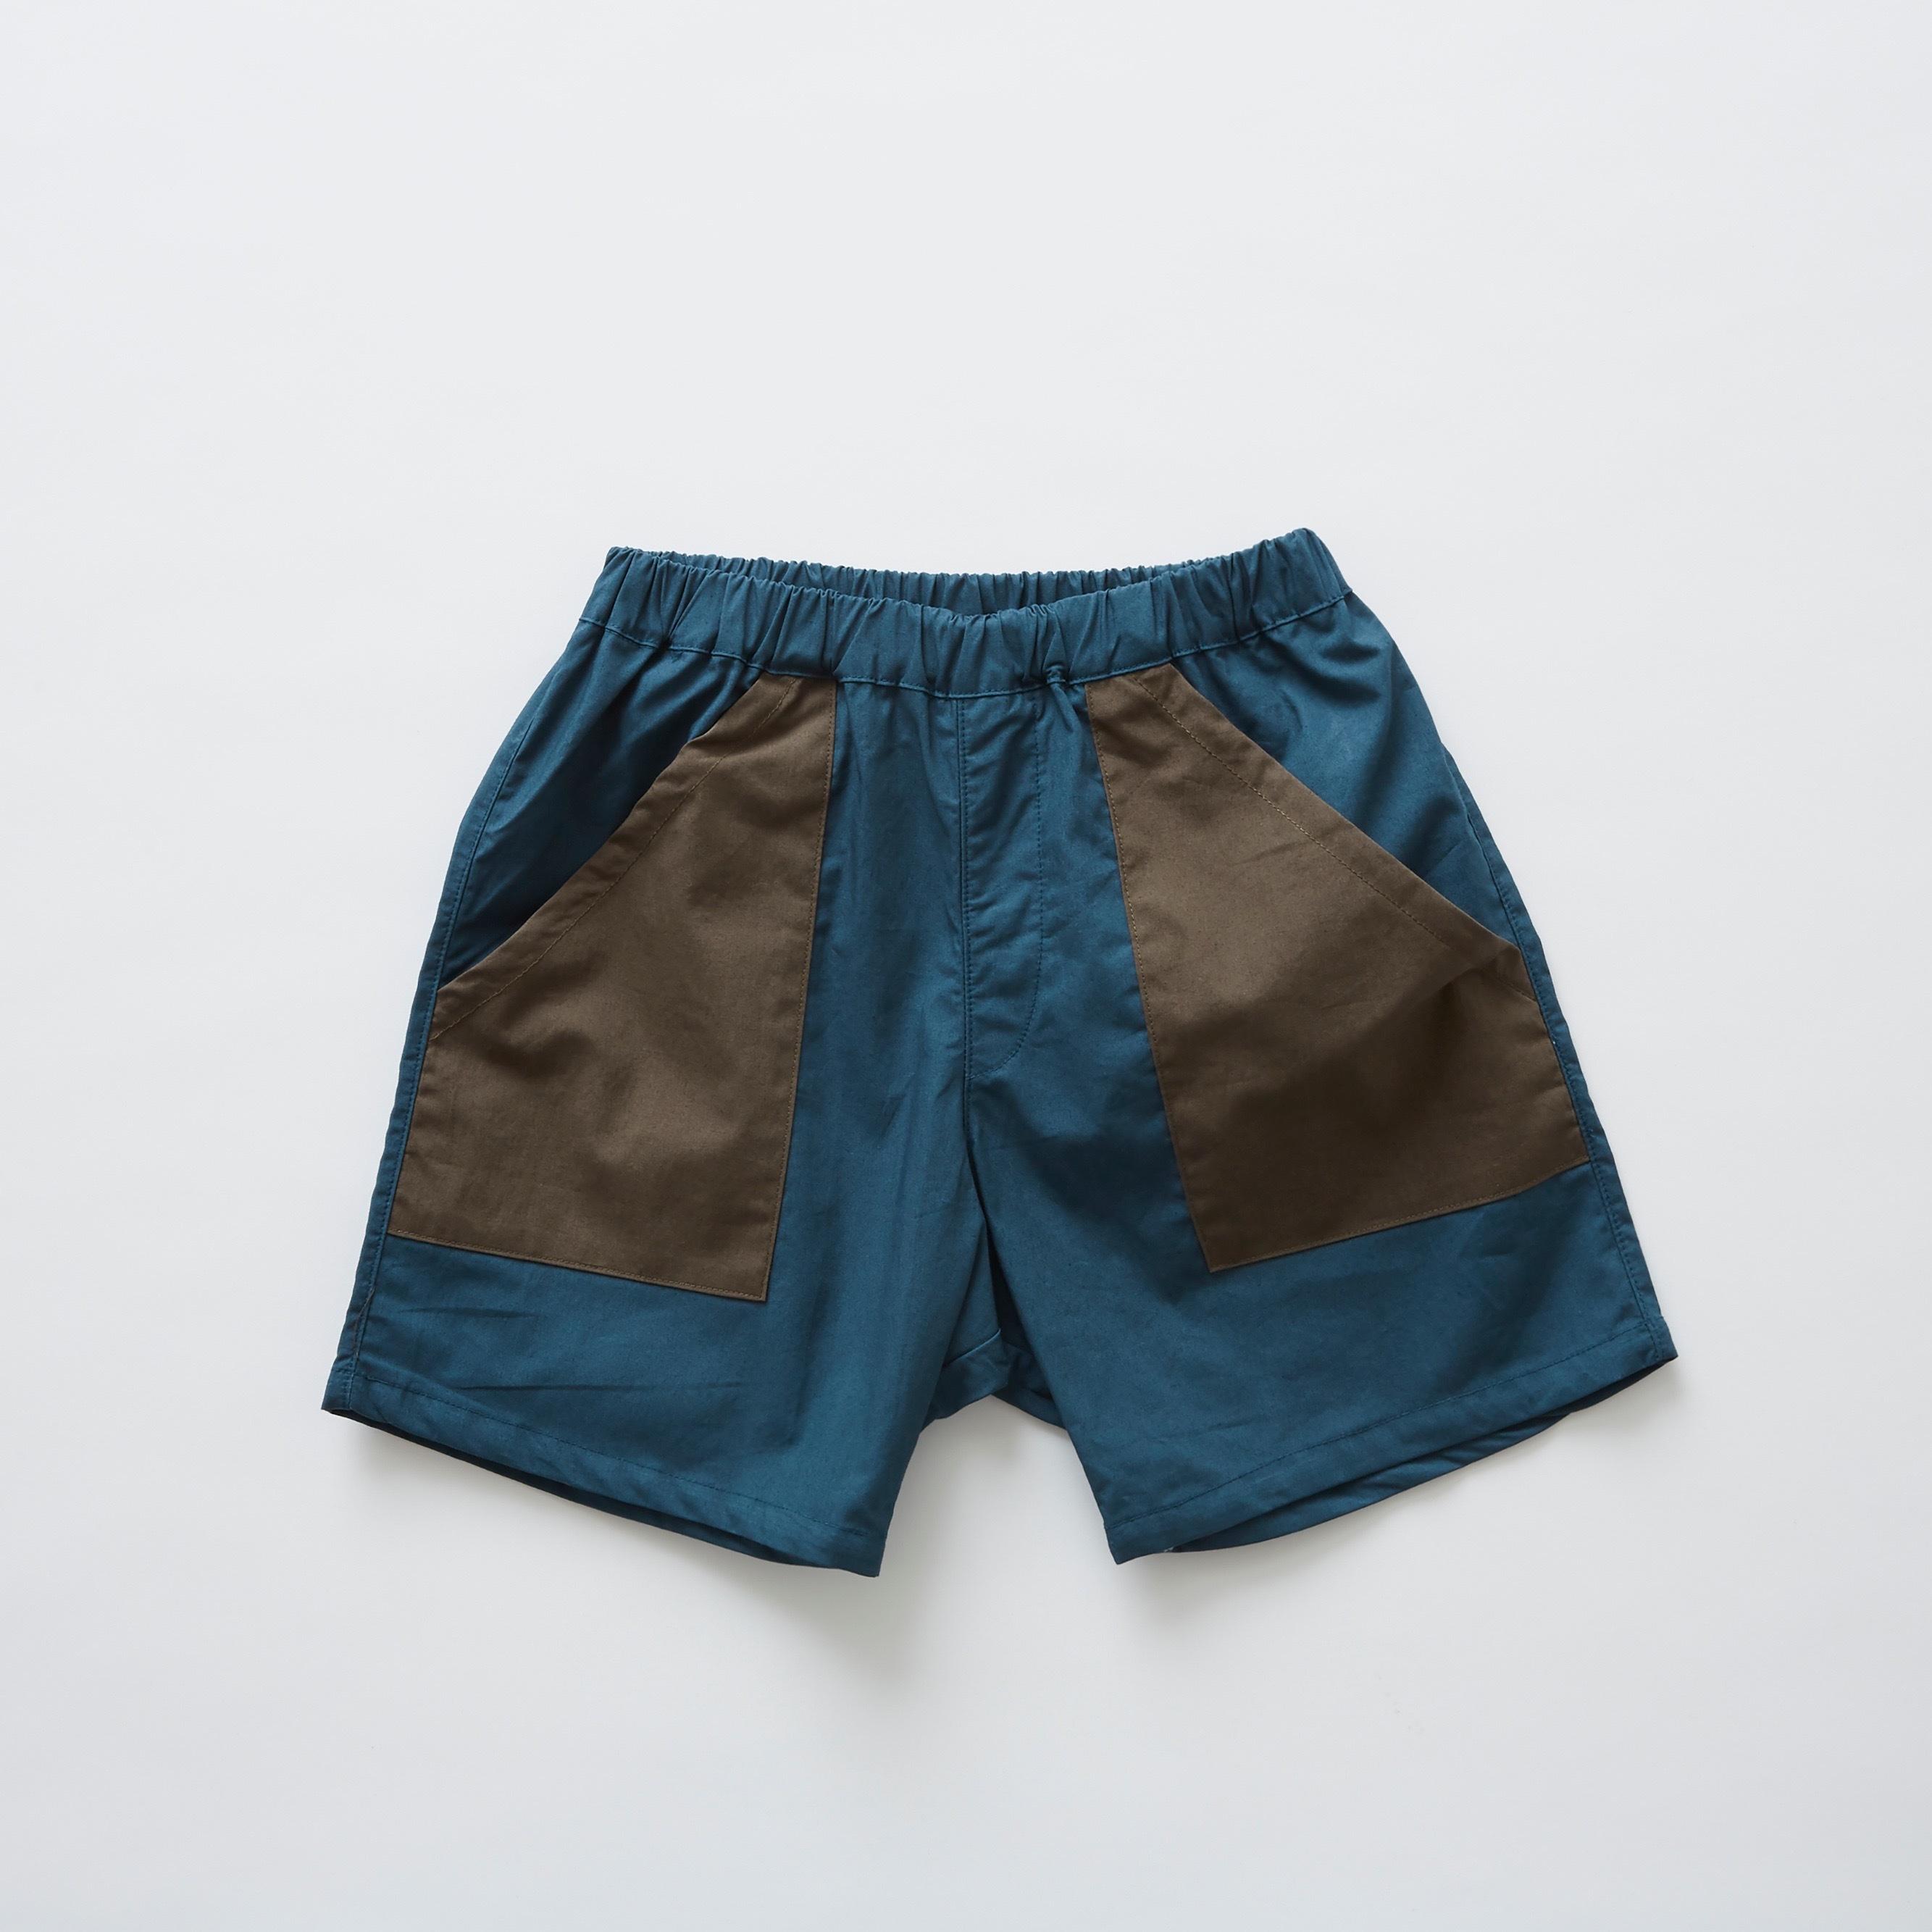 《eLfinFolk 2019SS》typewriter shorts / blue / 80-100cm